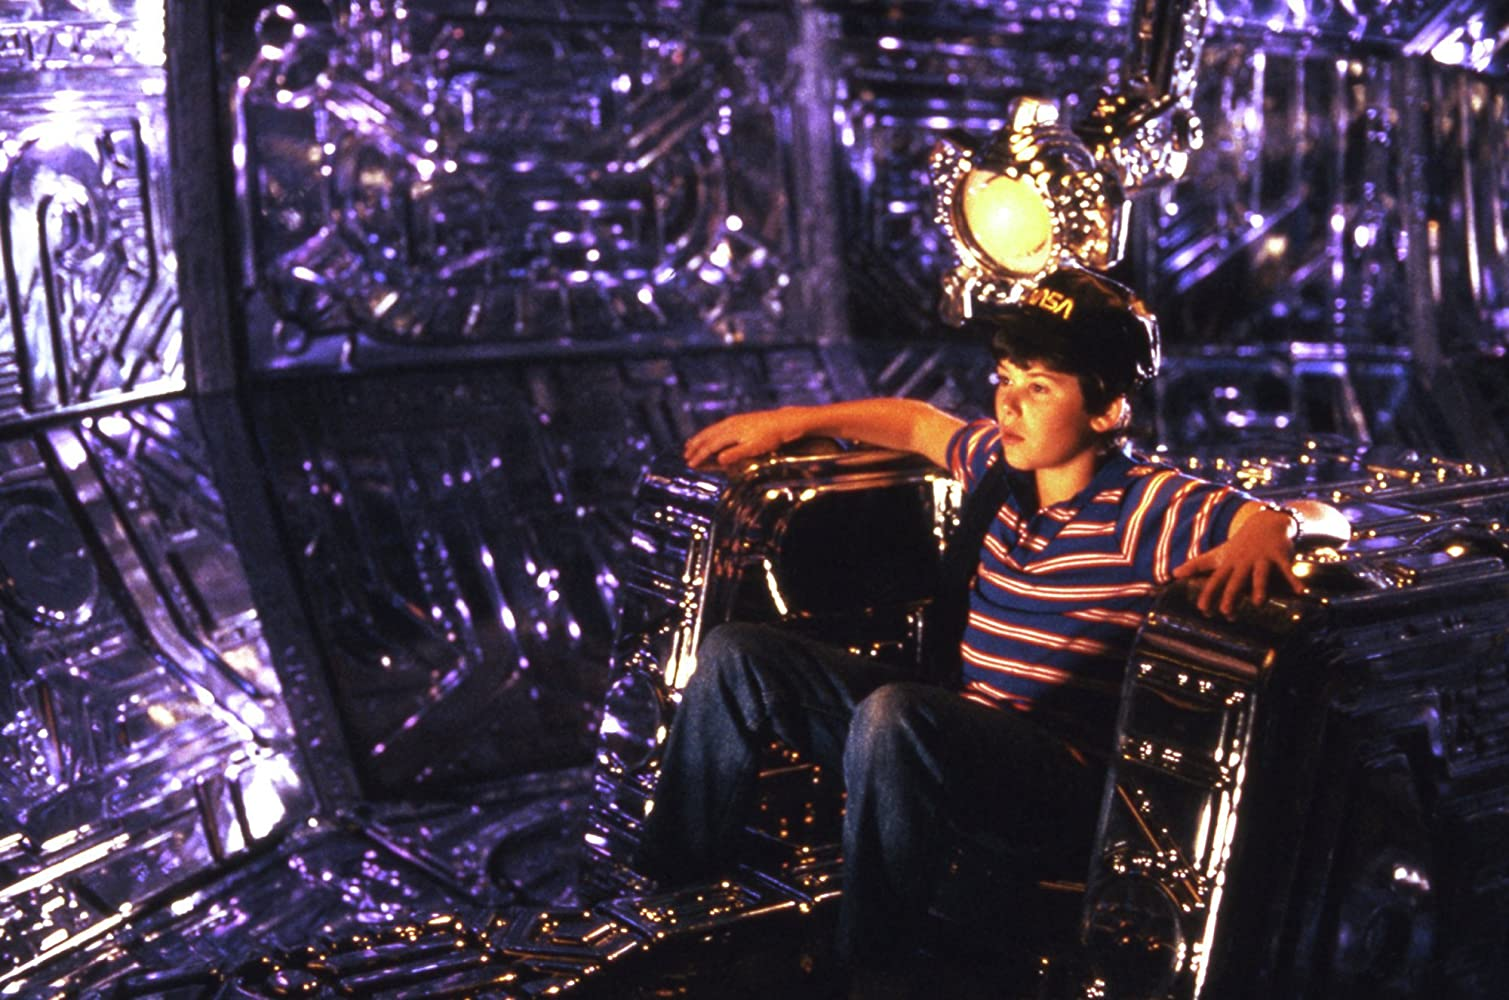 Joey Cramer in the spaceship in Flight of the Navigator (1986)